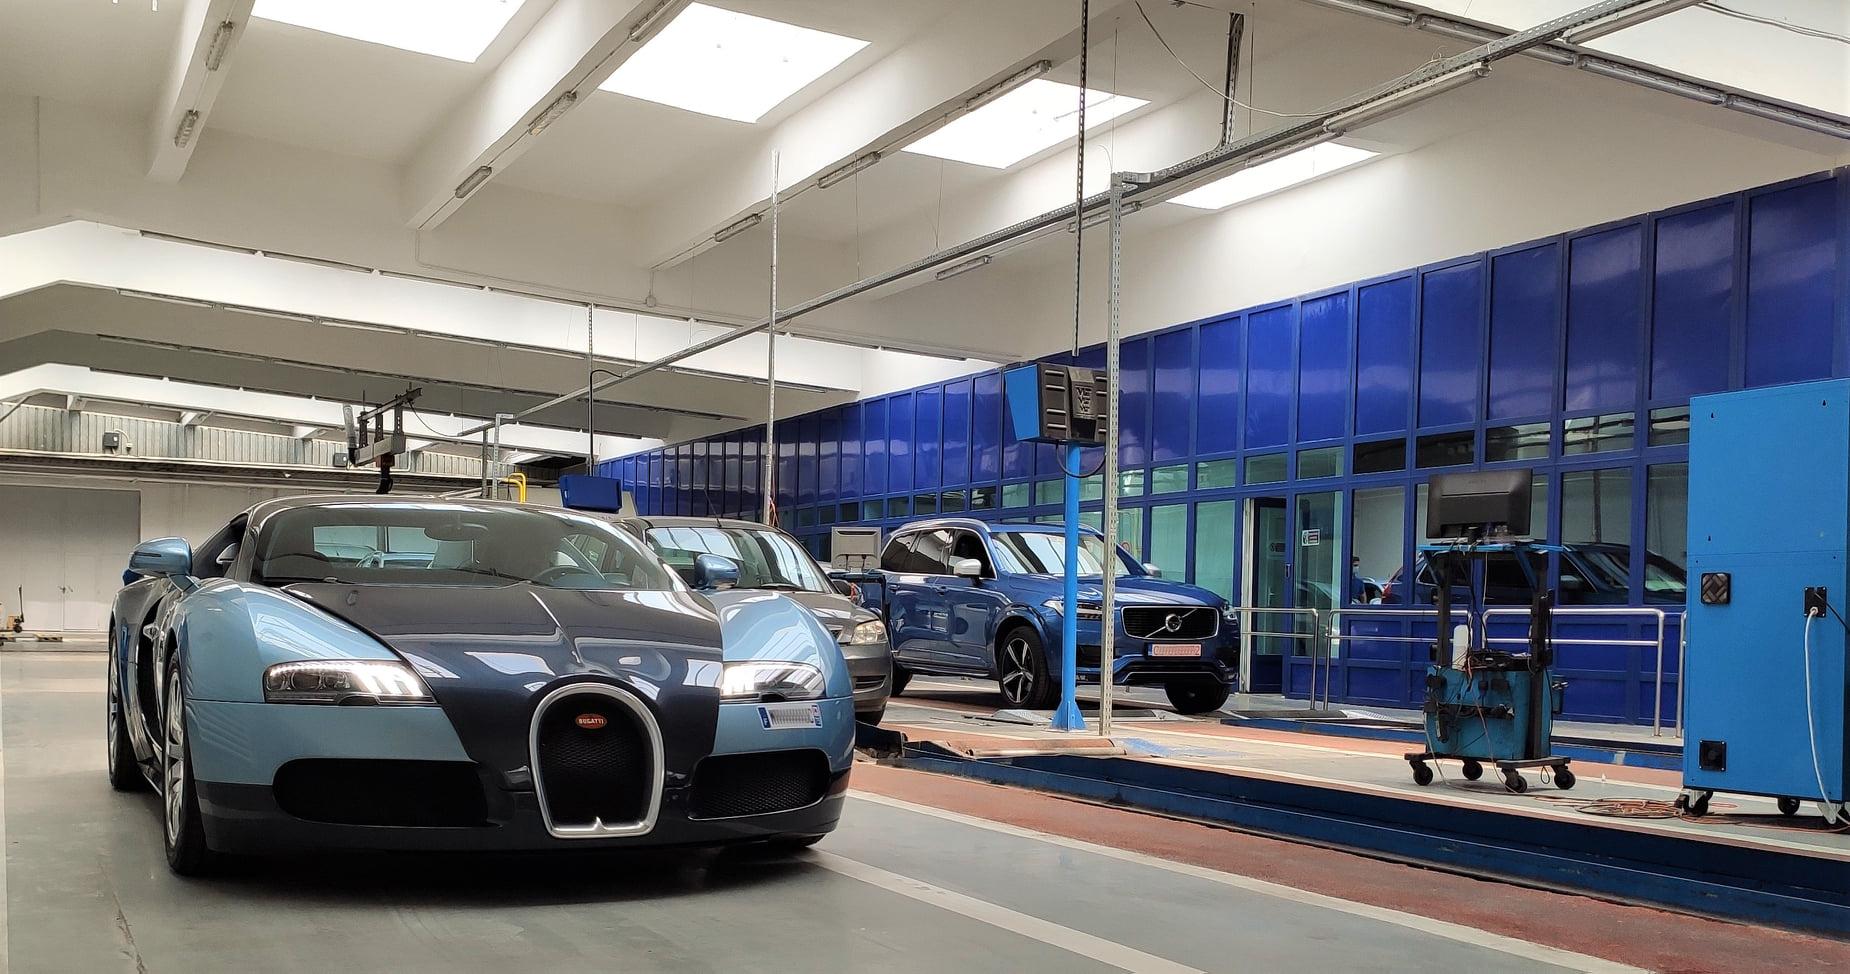 Un Bugatti Veyron, care costa 2 milioane de dolari atunci cand a fost fabricat, a fost inmatriculat in Romania, anunta RAR